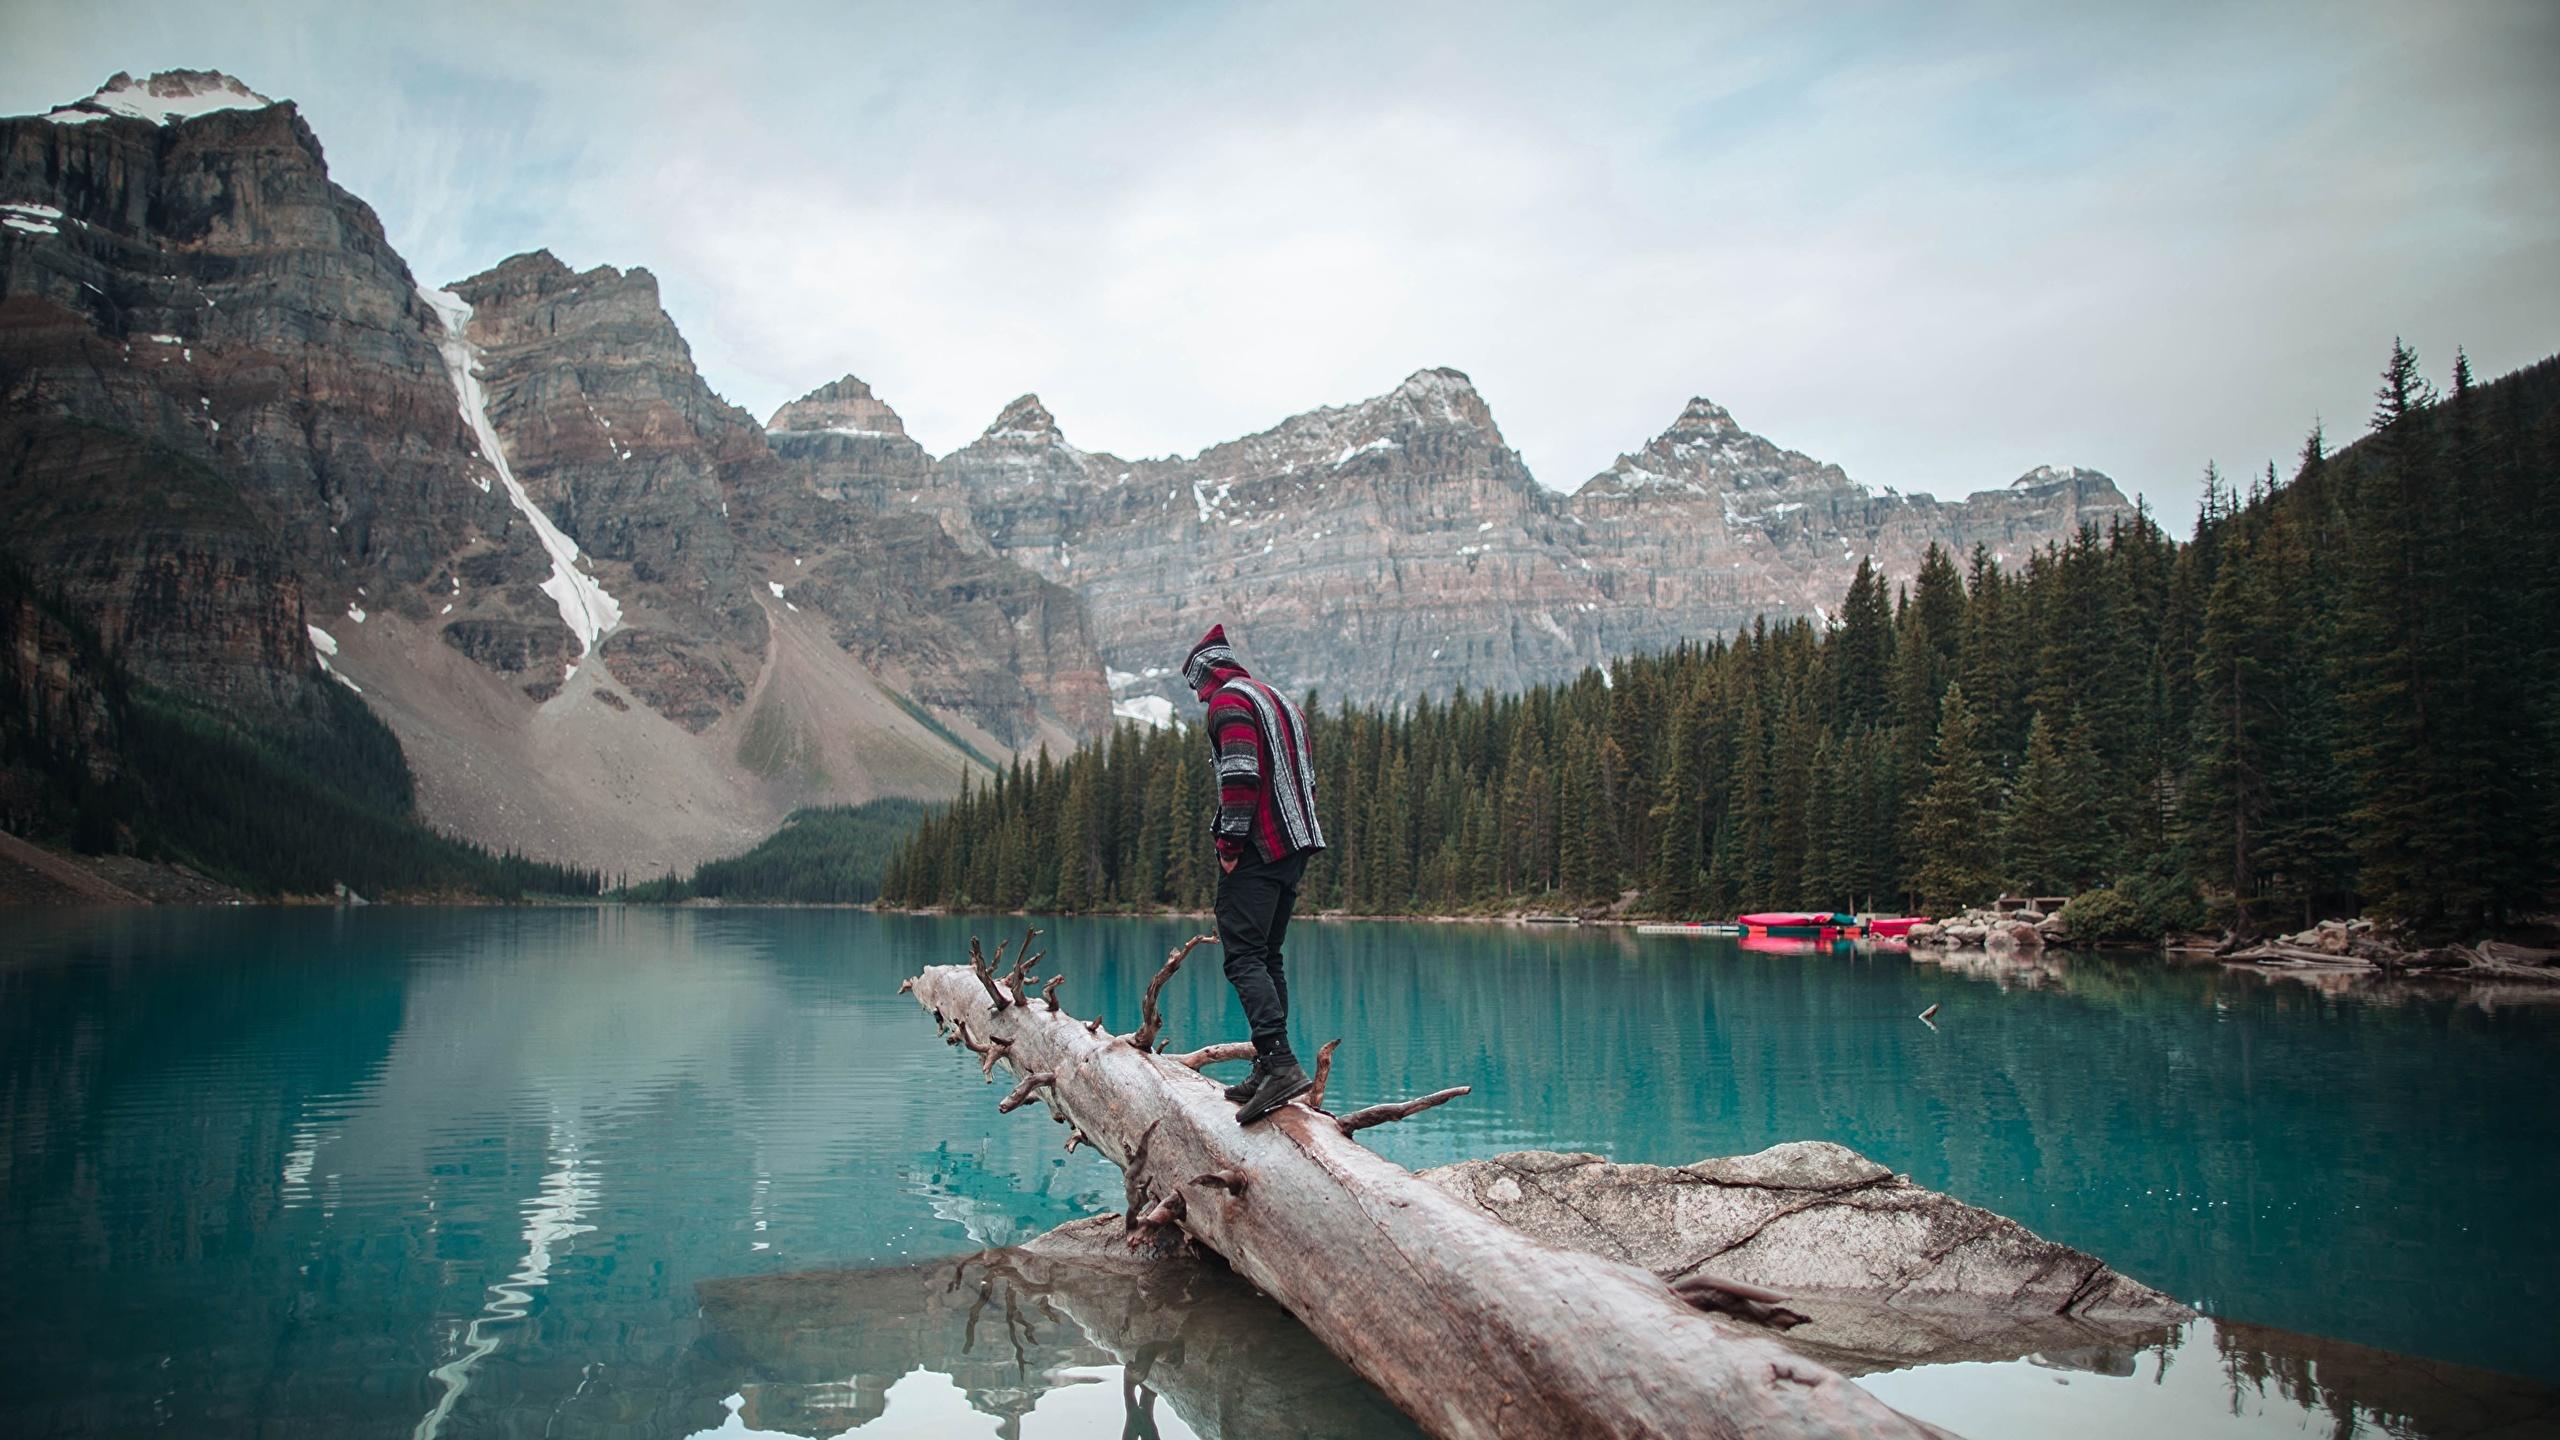 Desktop Wallpapers Banff Traveler Canada Moraine Lake 2560x1440